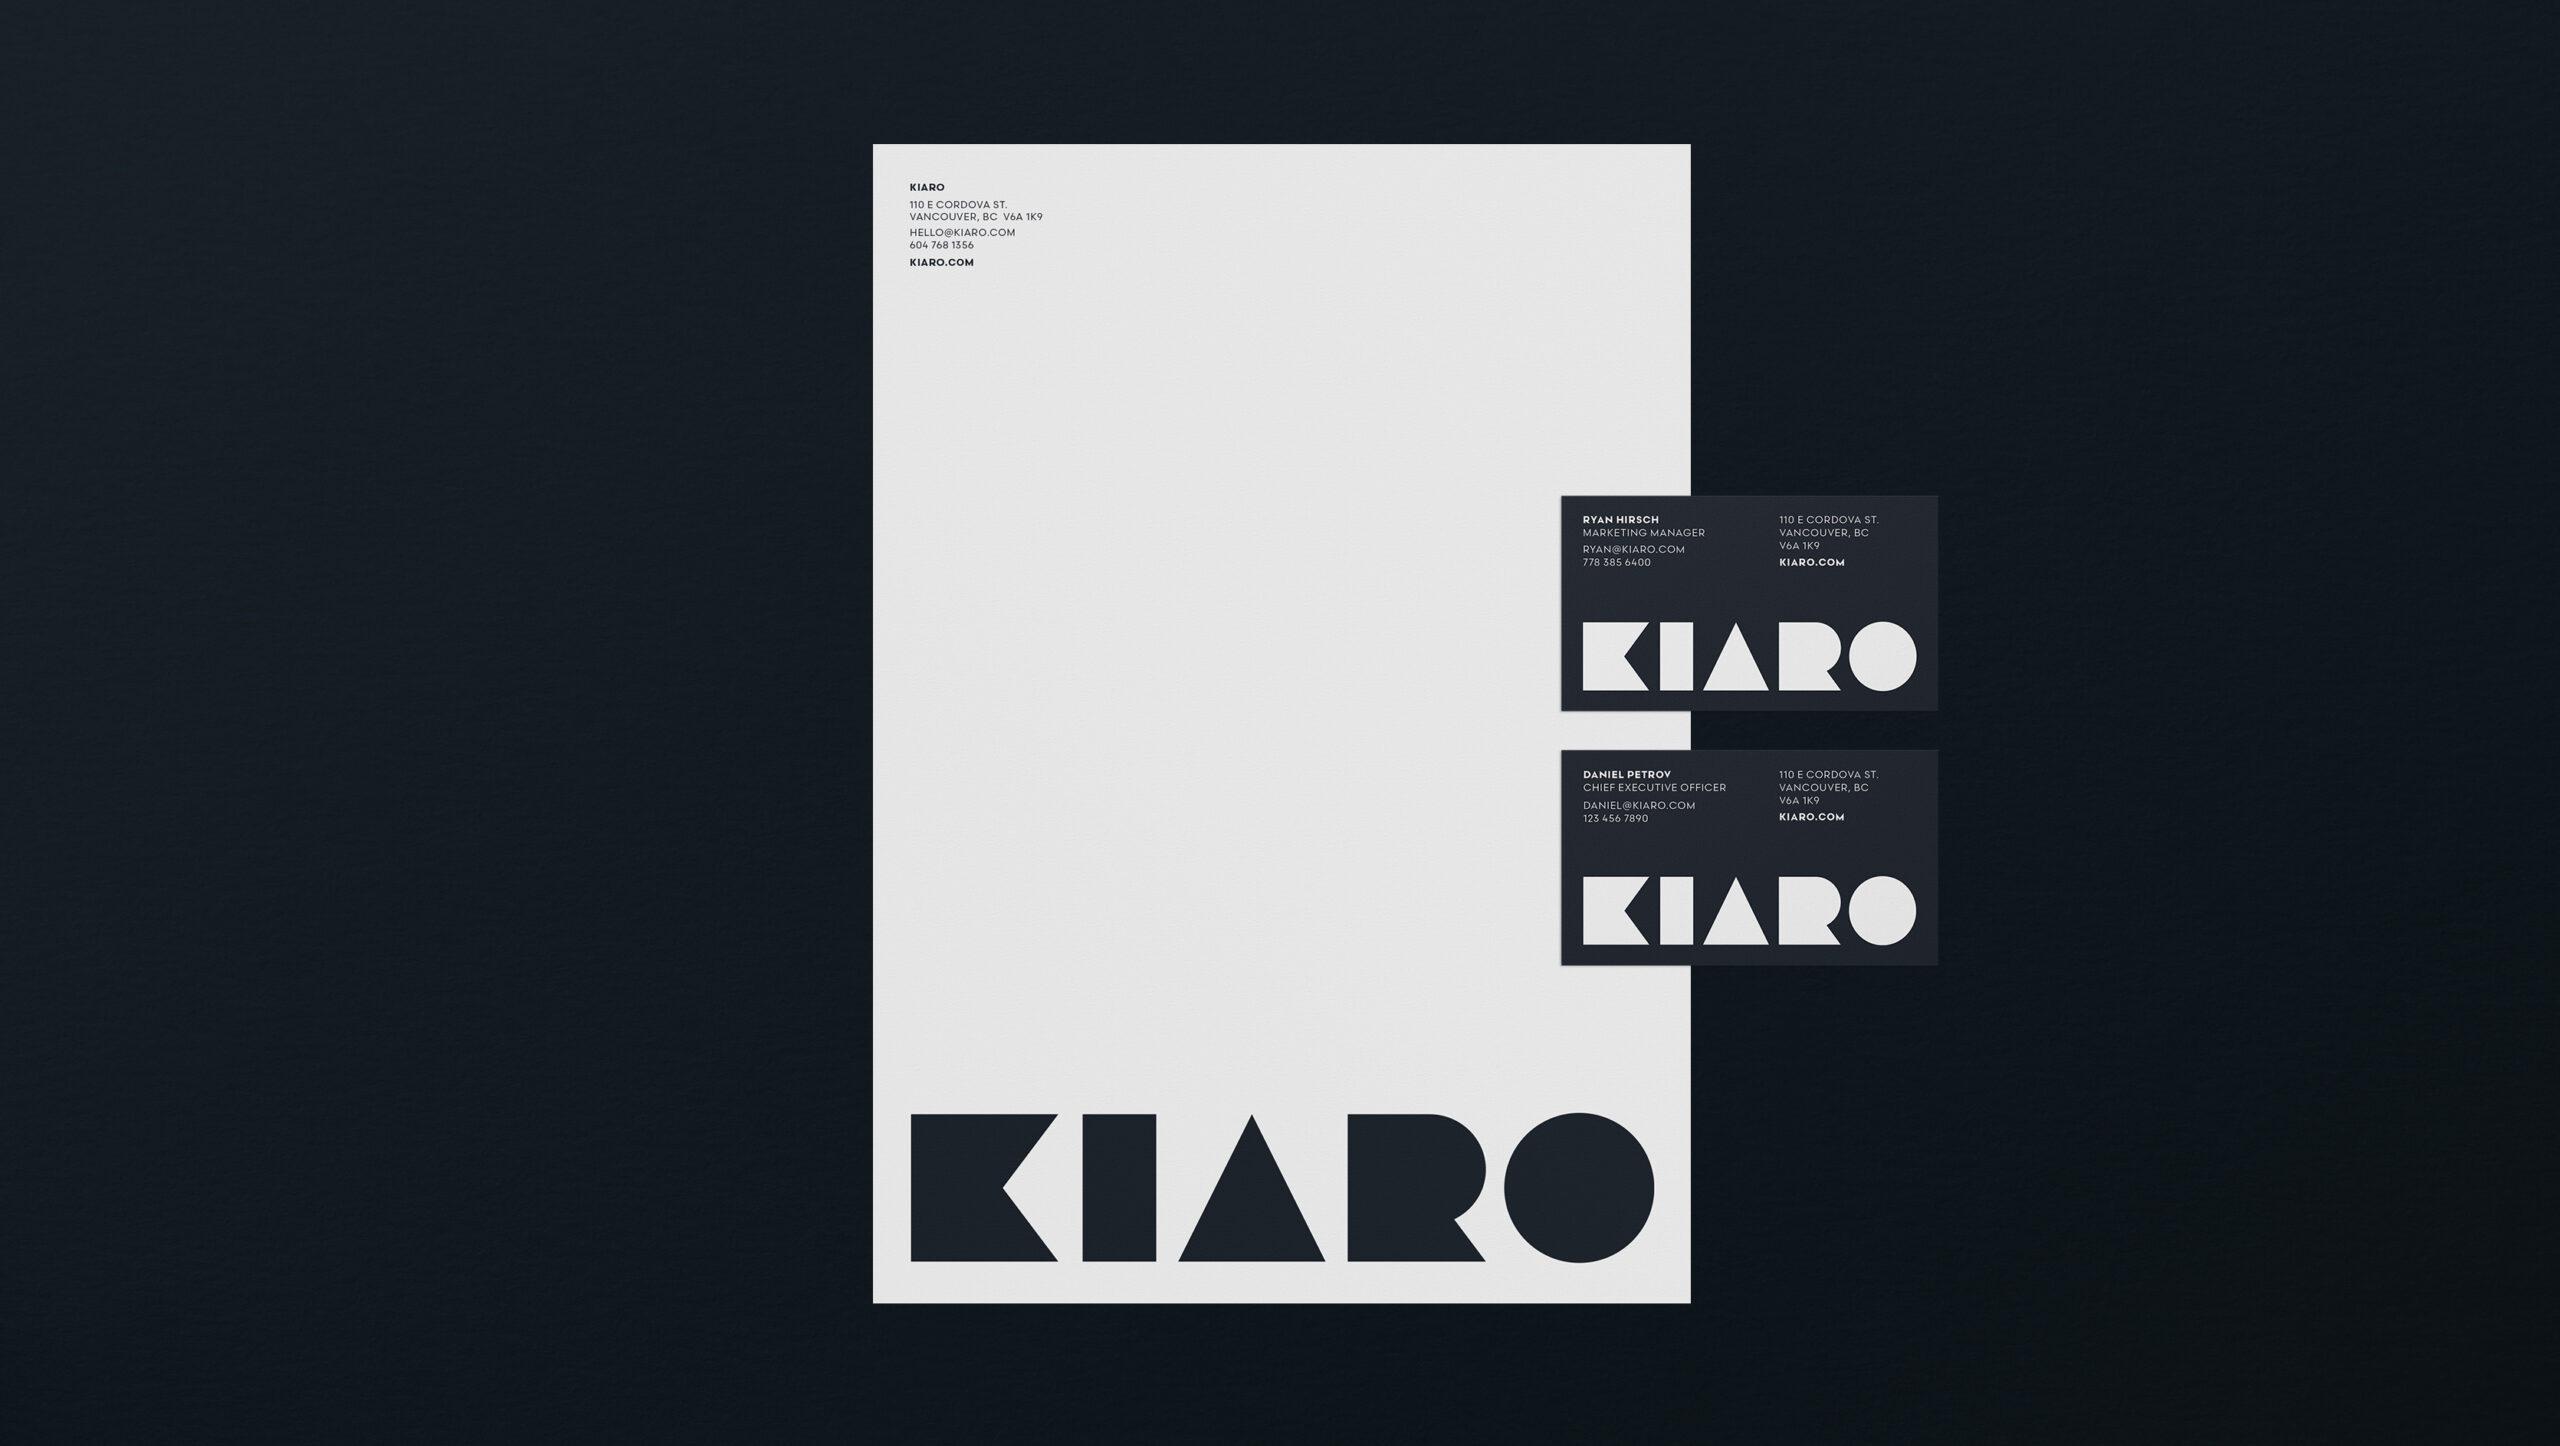 Kiaro_Portfolio_Brand_Stationery_2